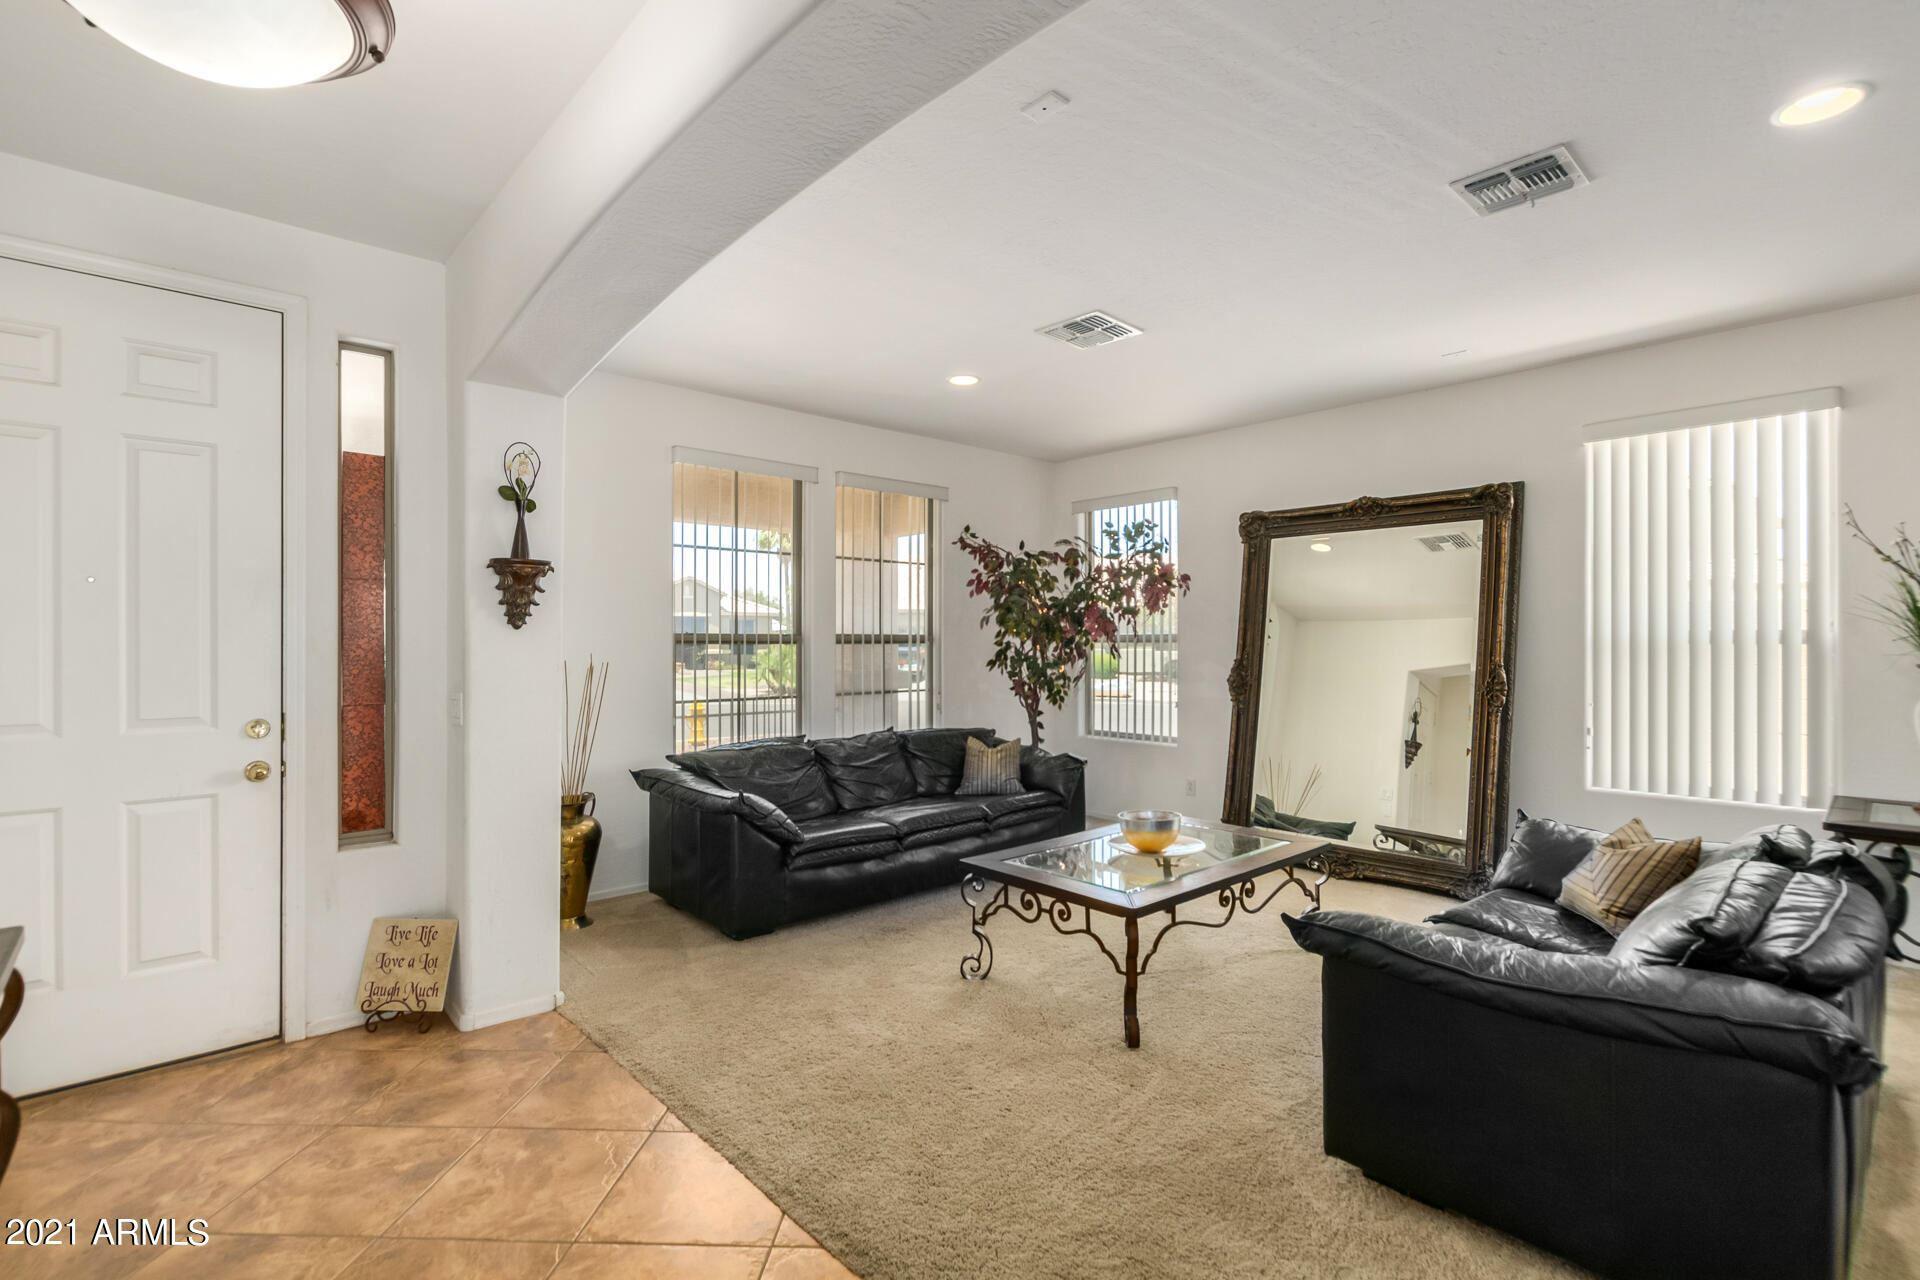 Photo of 40647 N PARISI Place, San Tan Valley, AZ 85140 (MLS # 6249352)